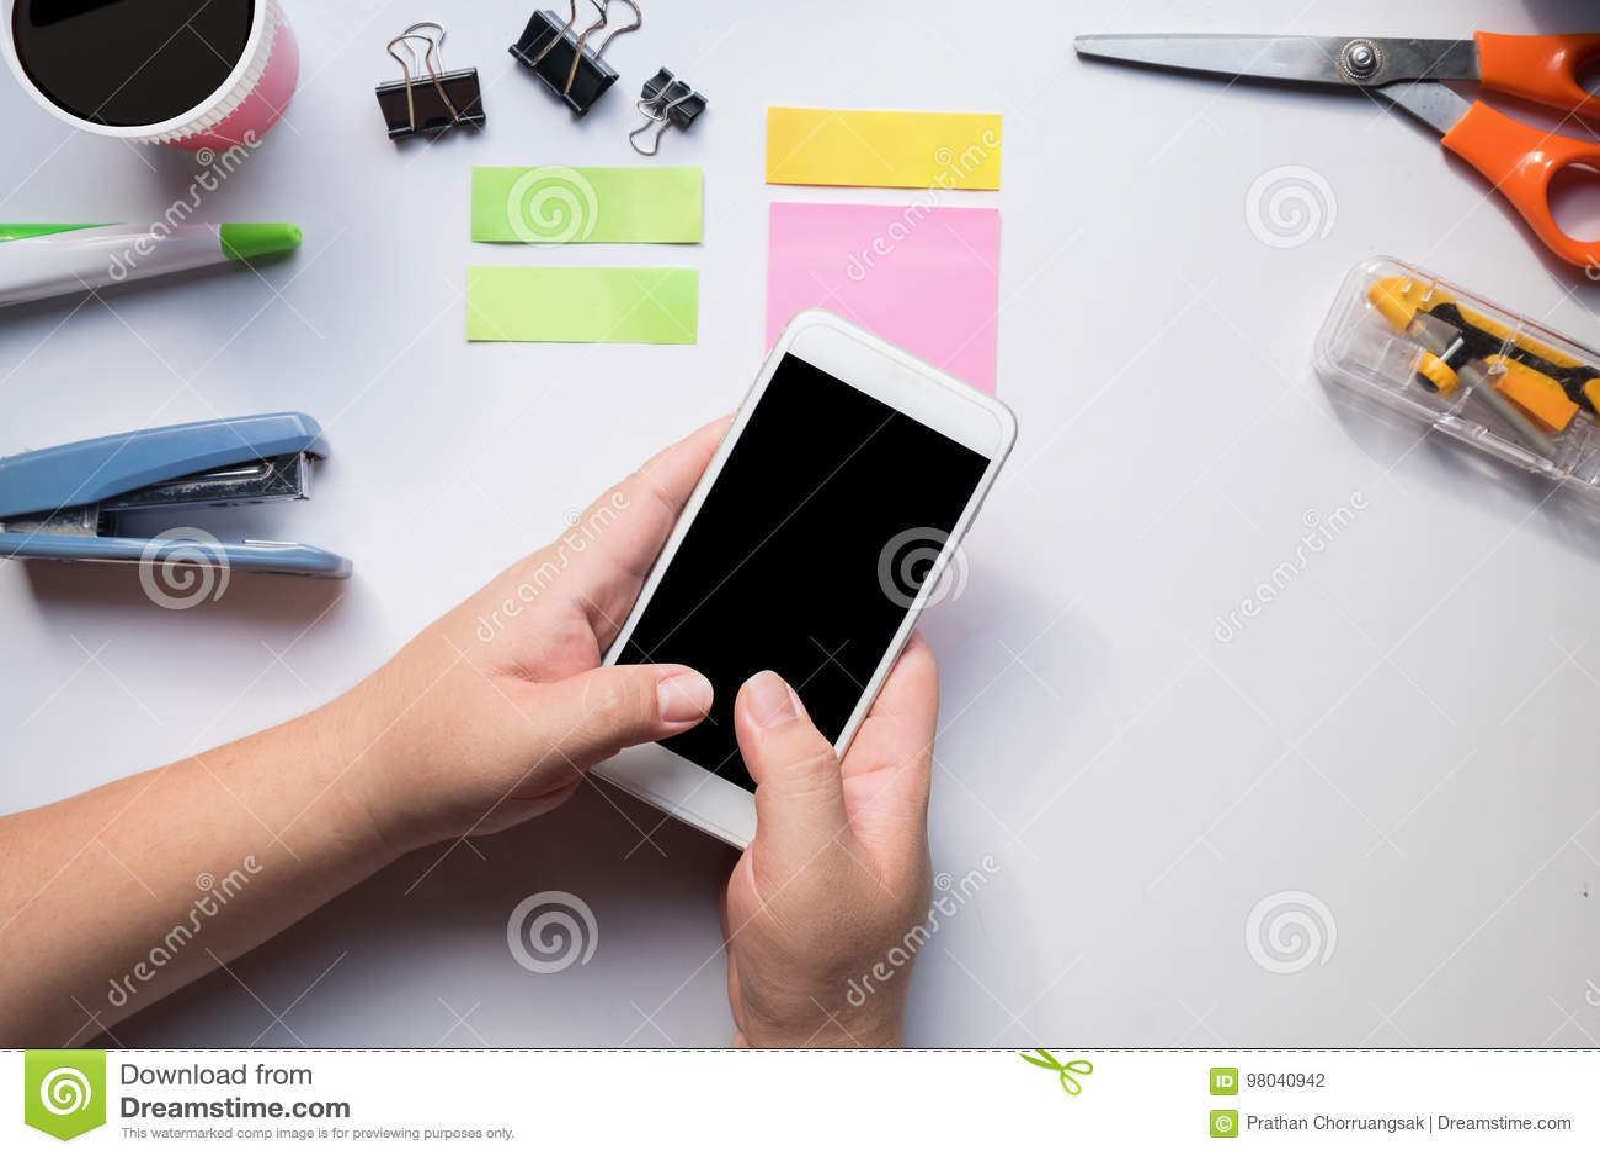 Hand using smartphone on office desk.